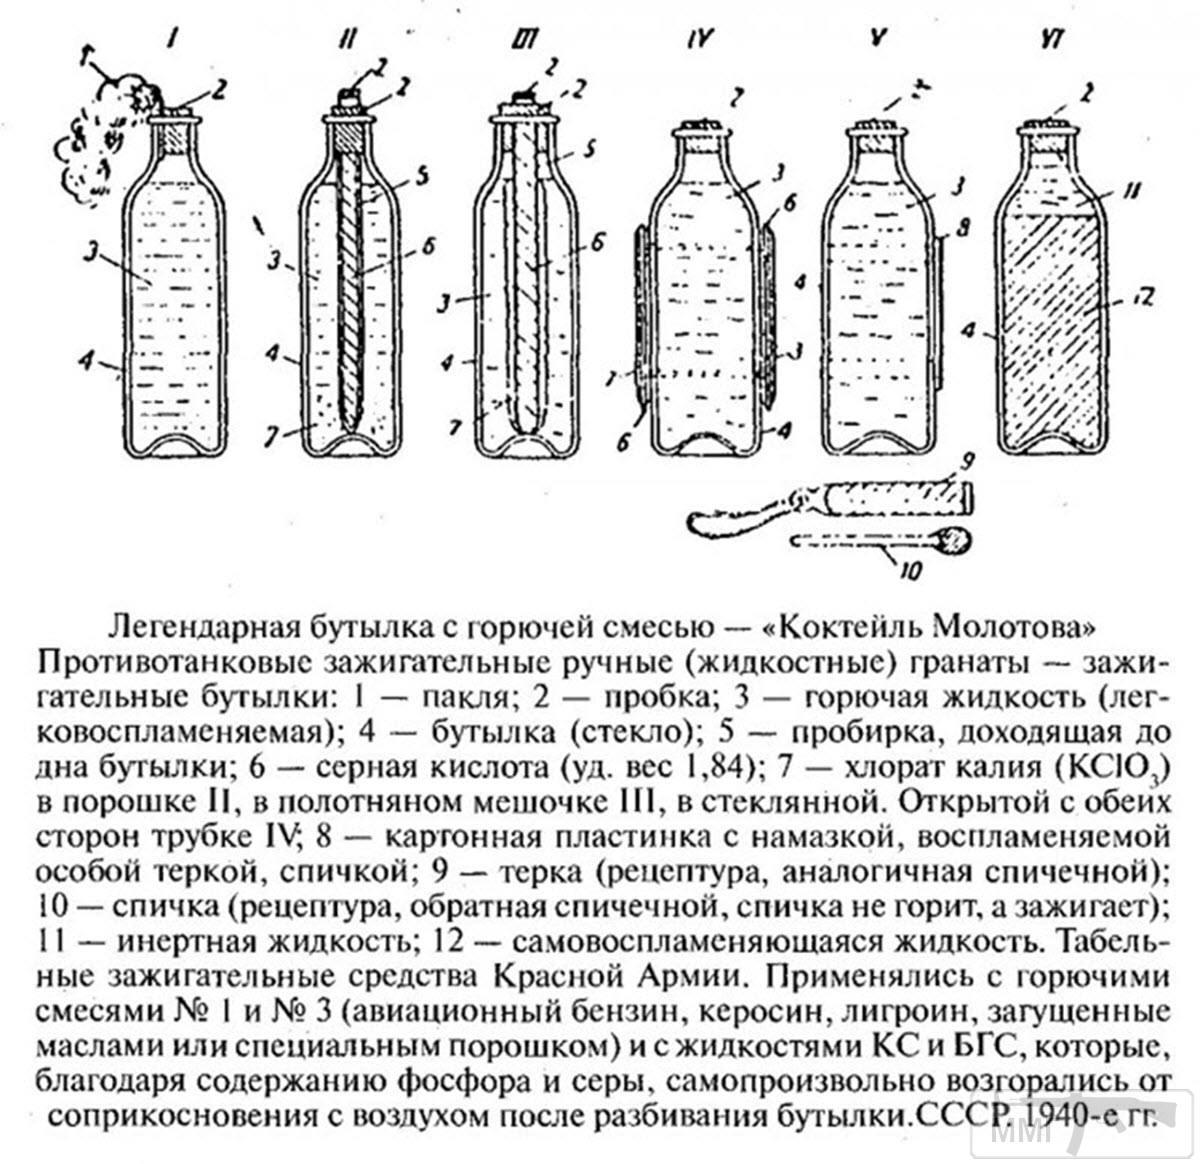 19067 - Коктейль Молотова.